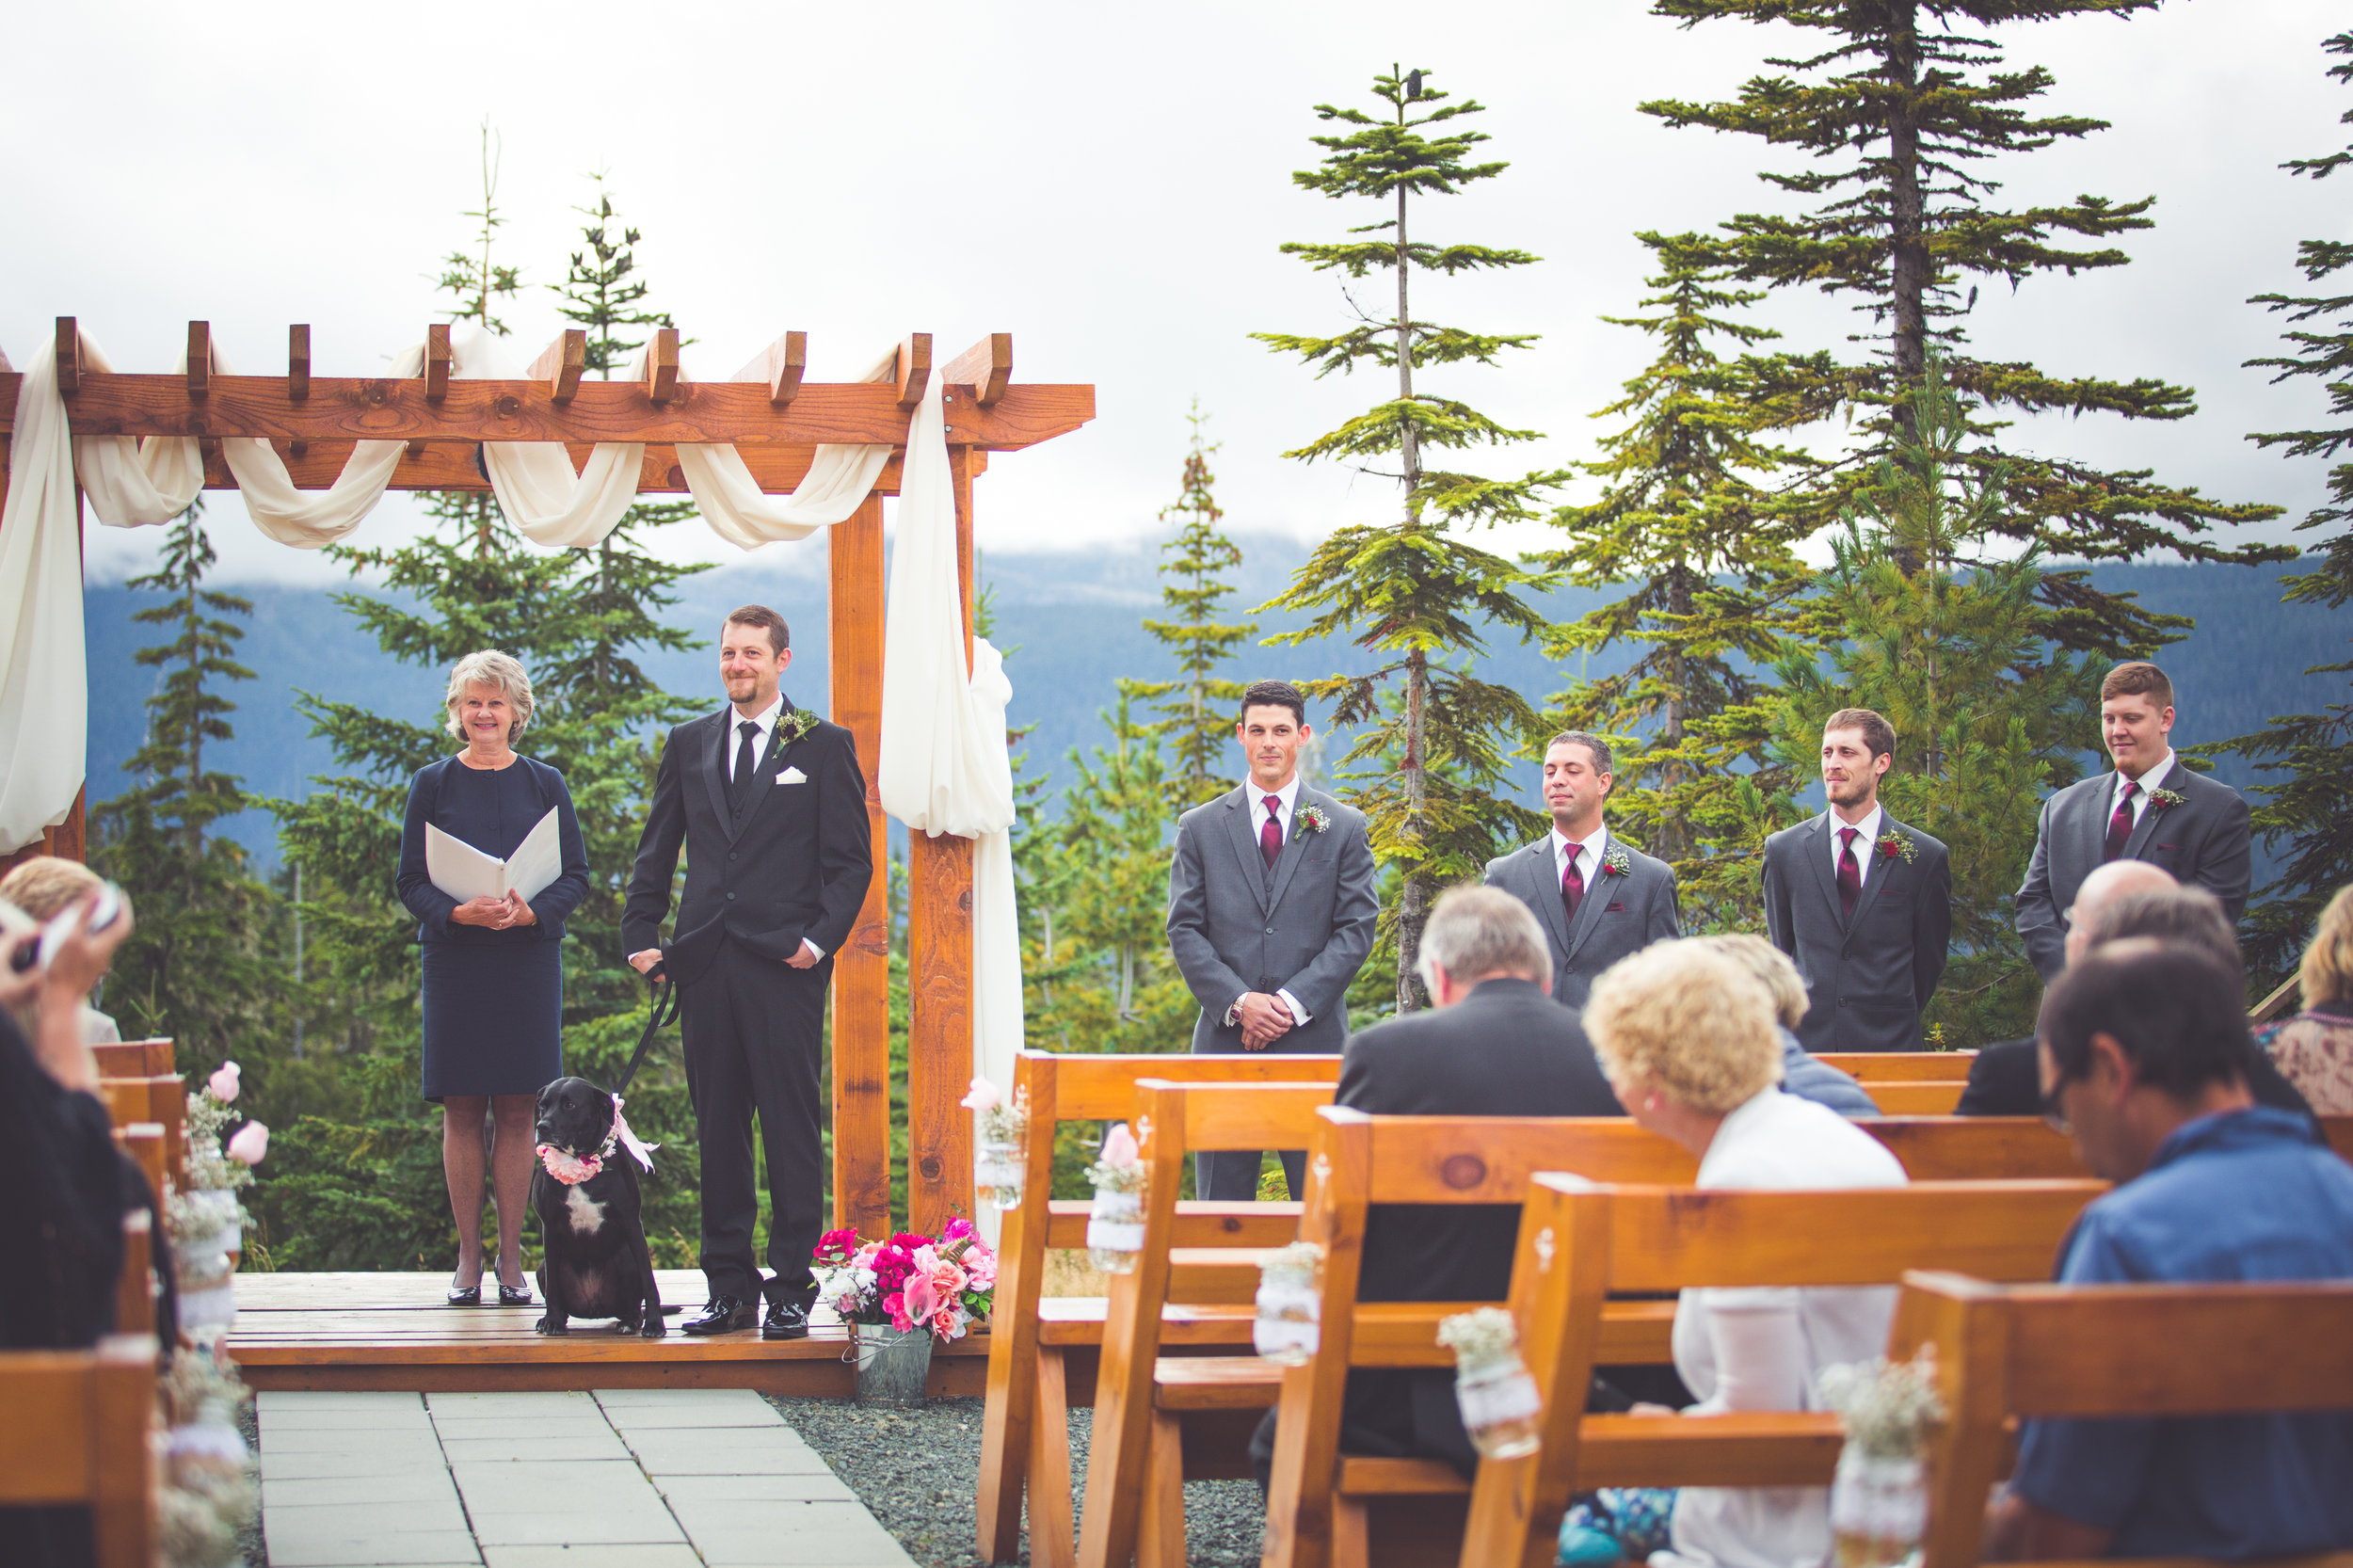 groom awaits bride at mount washington resort wedding